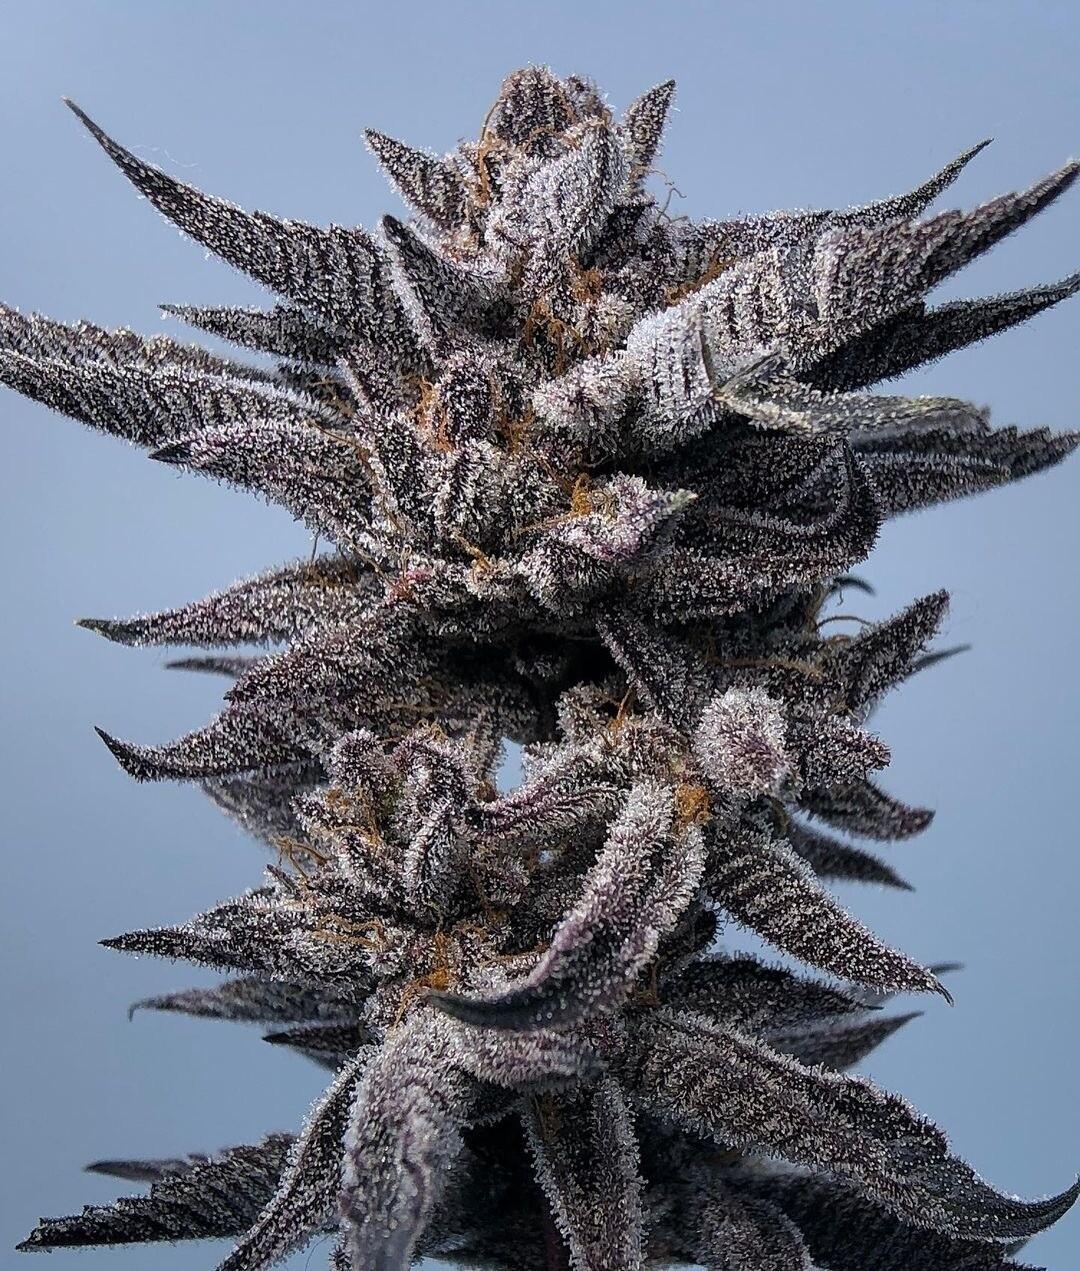 Dosi Dos Stomper - 12 Regular Seeds - Sunken Treasure - Plus Freebie 10 Seeds GCP (gg4 x cookie x purp)